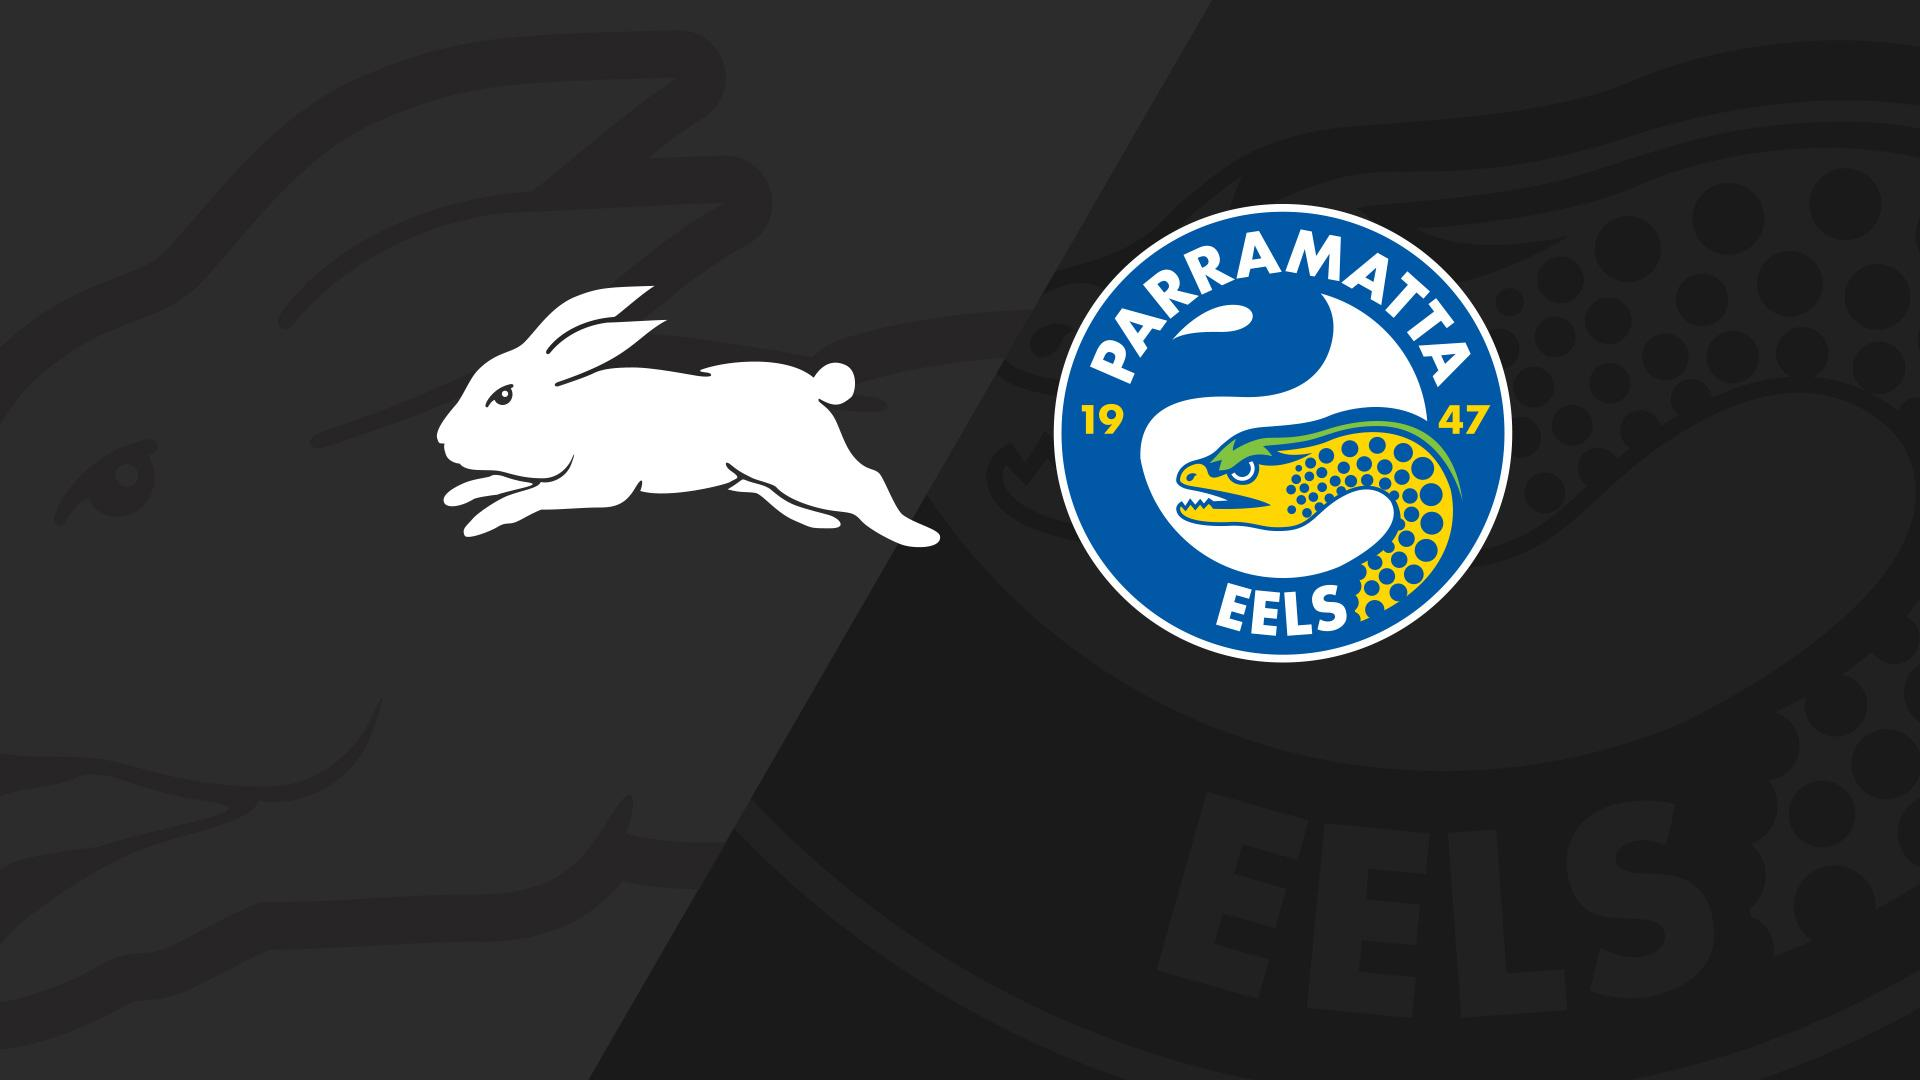 Full Match Replay: Rabbitohs v Eels - Round 20, 2018